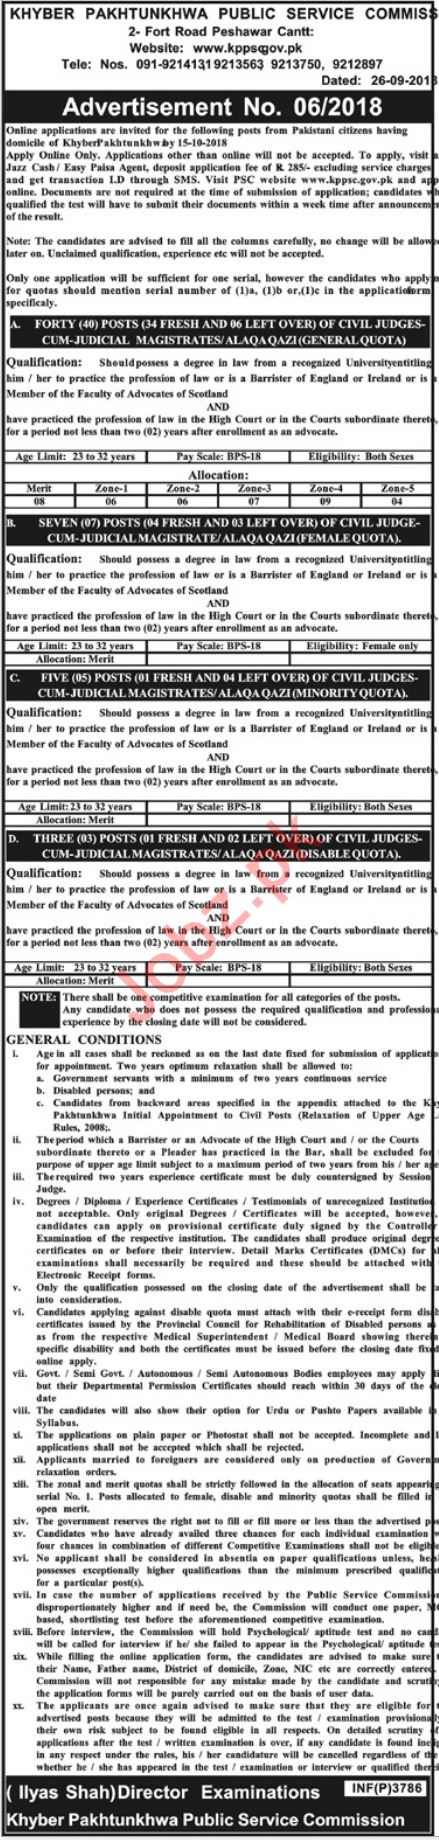 Khyber Pakhtunkhwa Public Service Commission KPPSC Jobs 2018